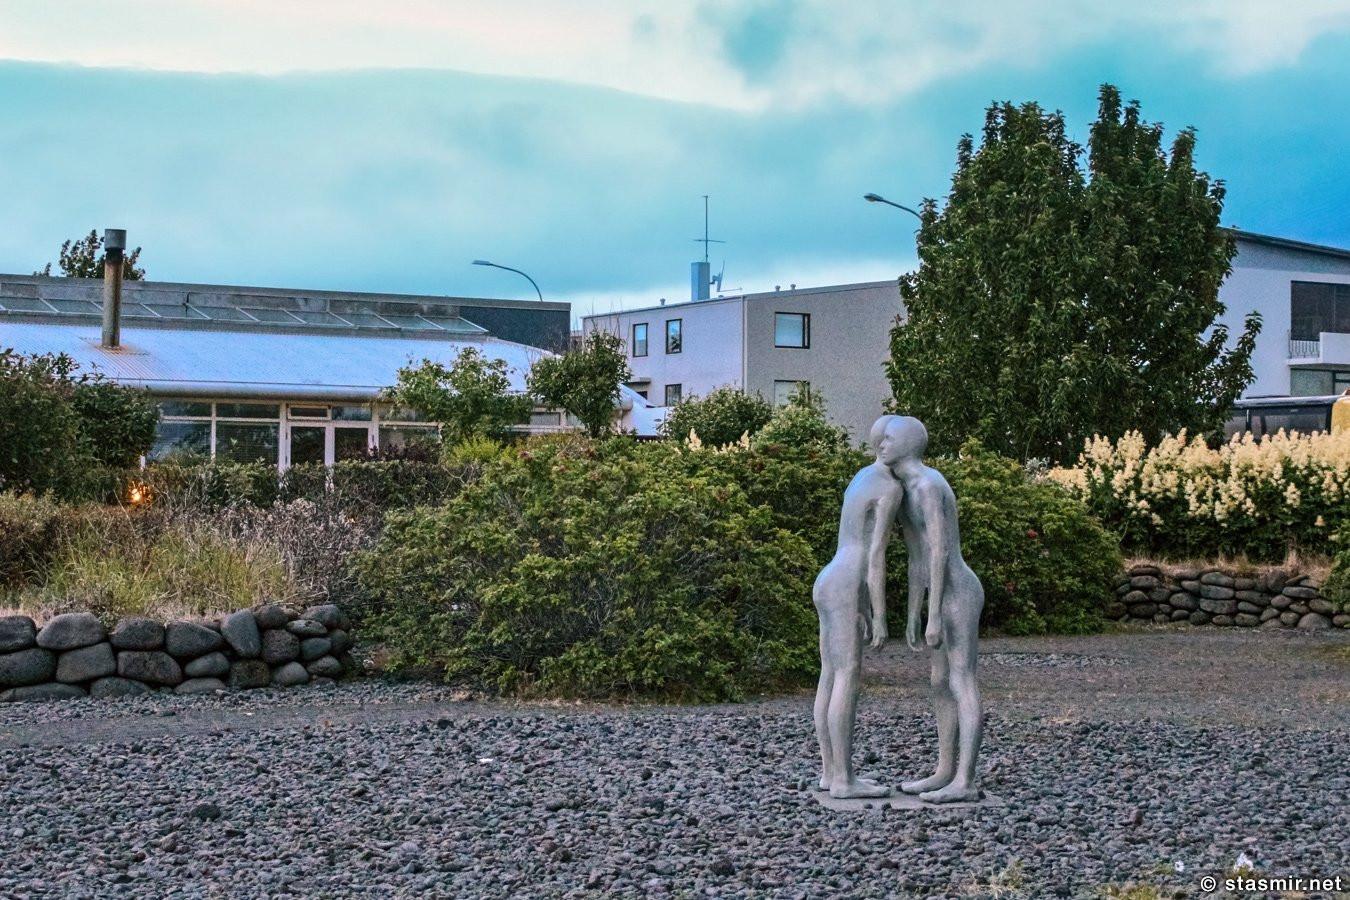 Скульптура «Тени» Steinunn Þórarinsdóttir, Рейкьявик, Селтьярнарнес, Фото Стасмир, Photo Stasmir